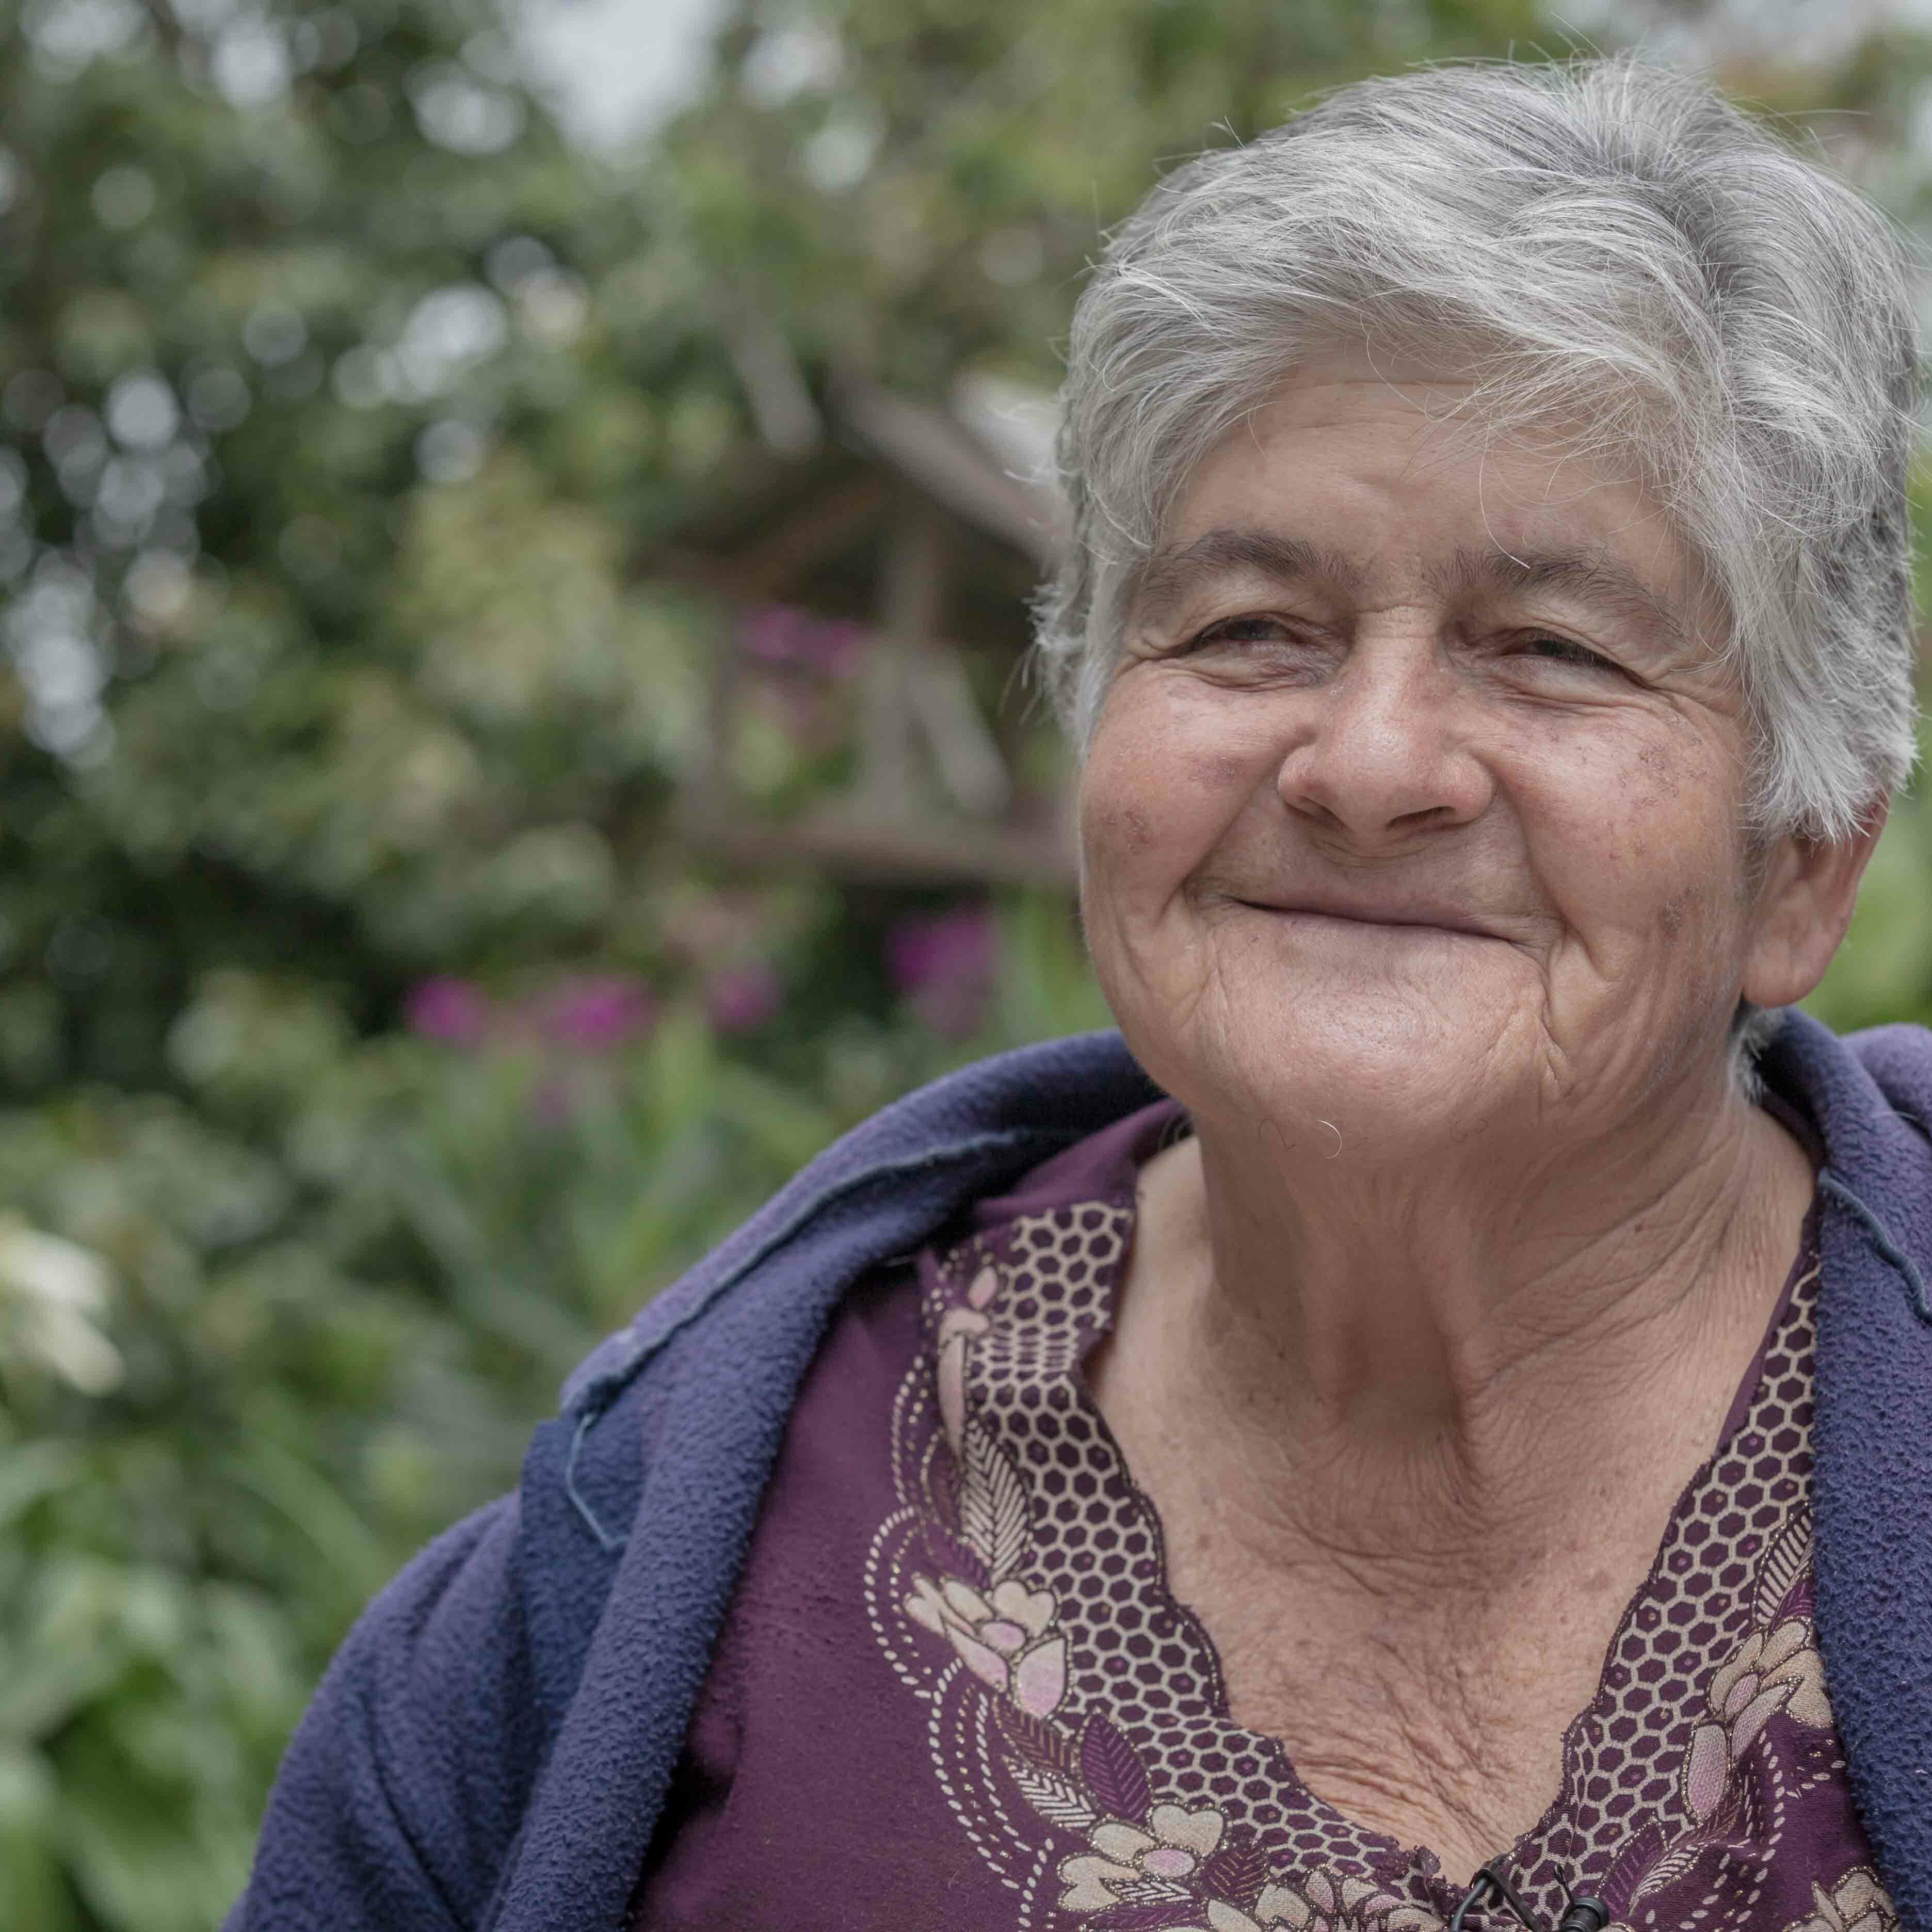 Rosa Angélica Alzate Soto